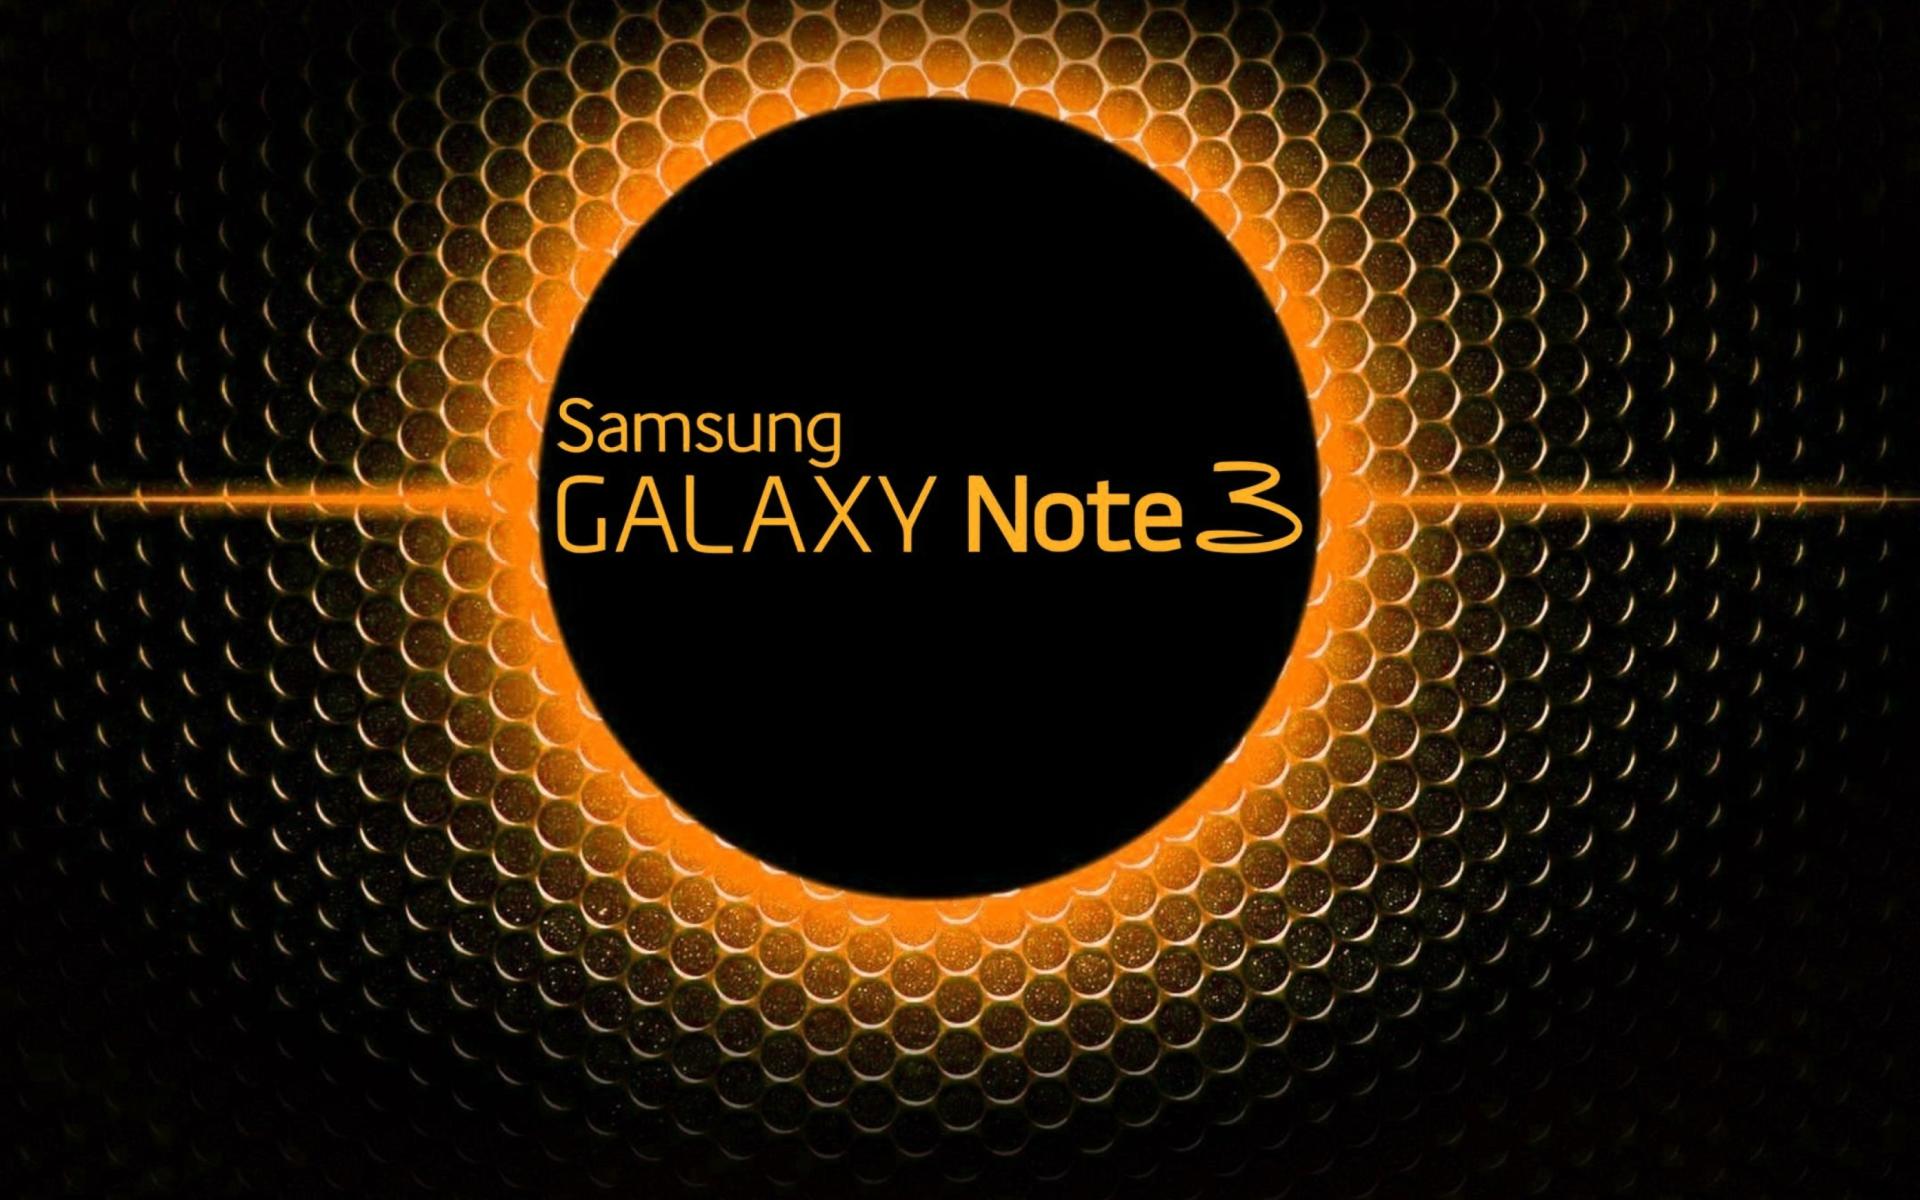 Samsung Galaxy Note 3 Wallpaper For Widescreen Desktop PC